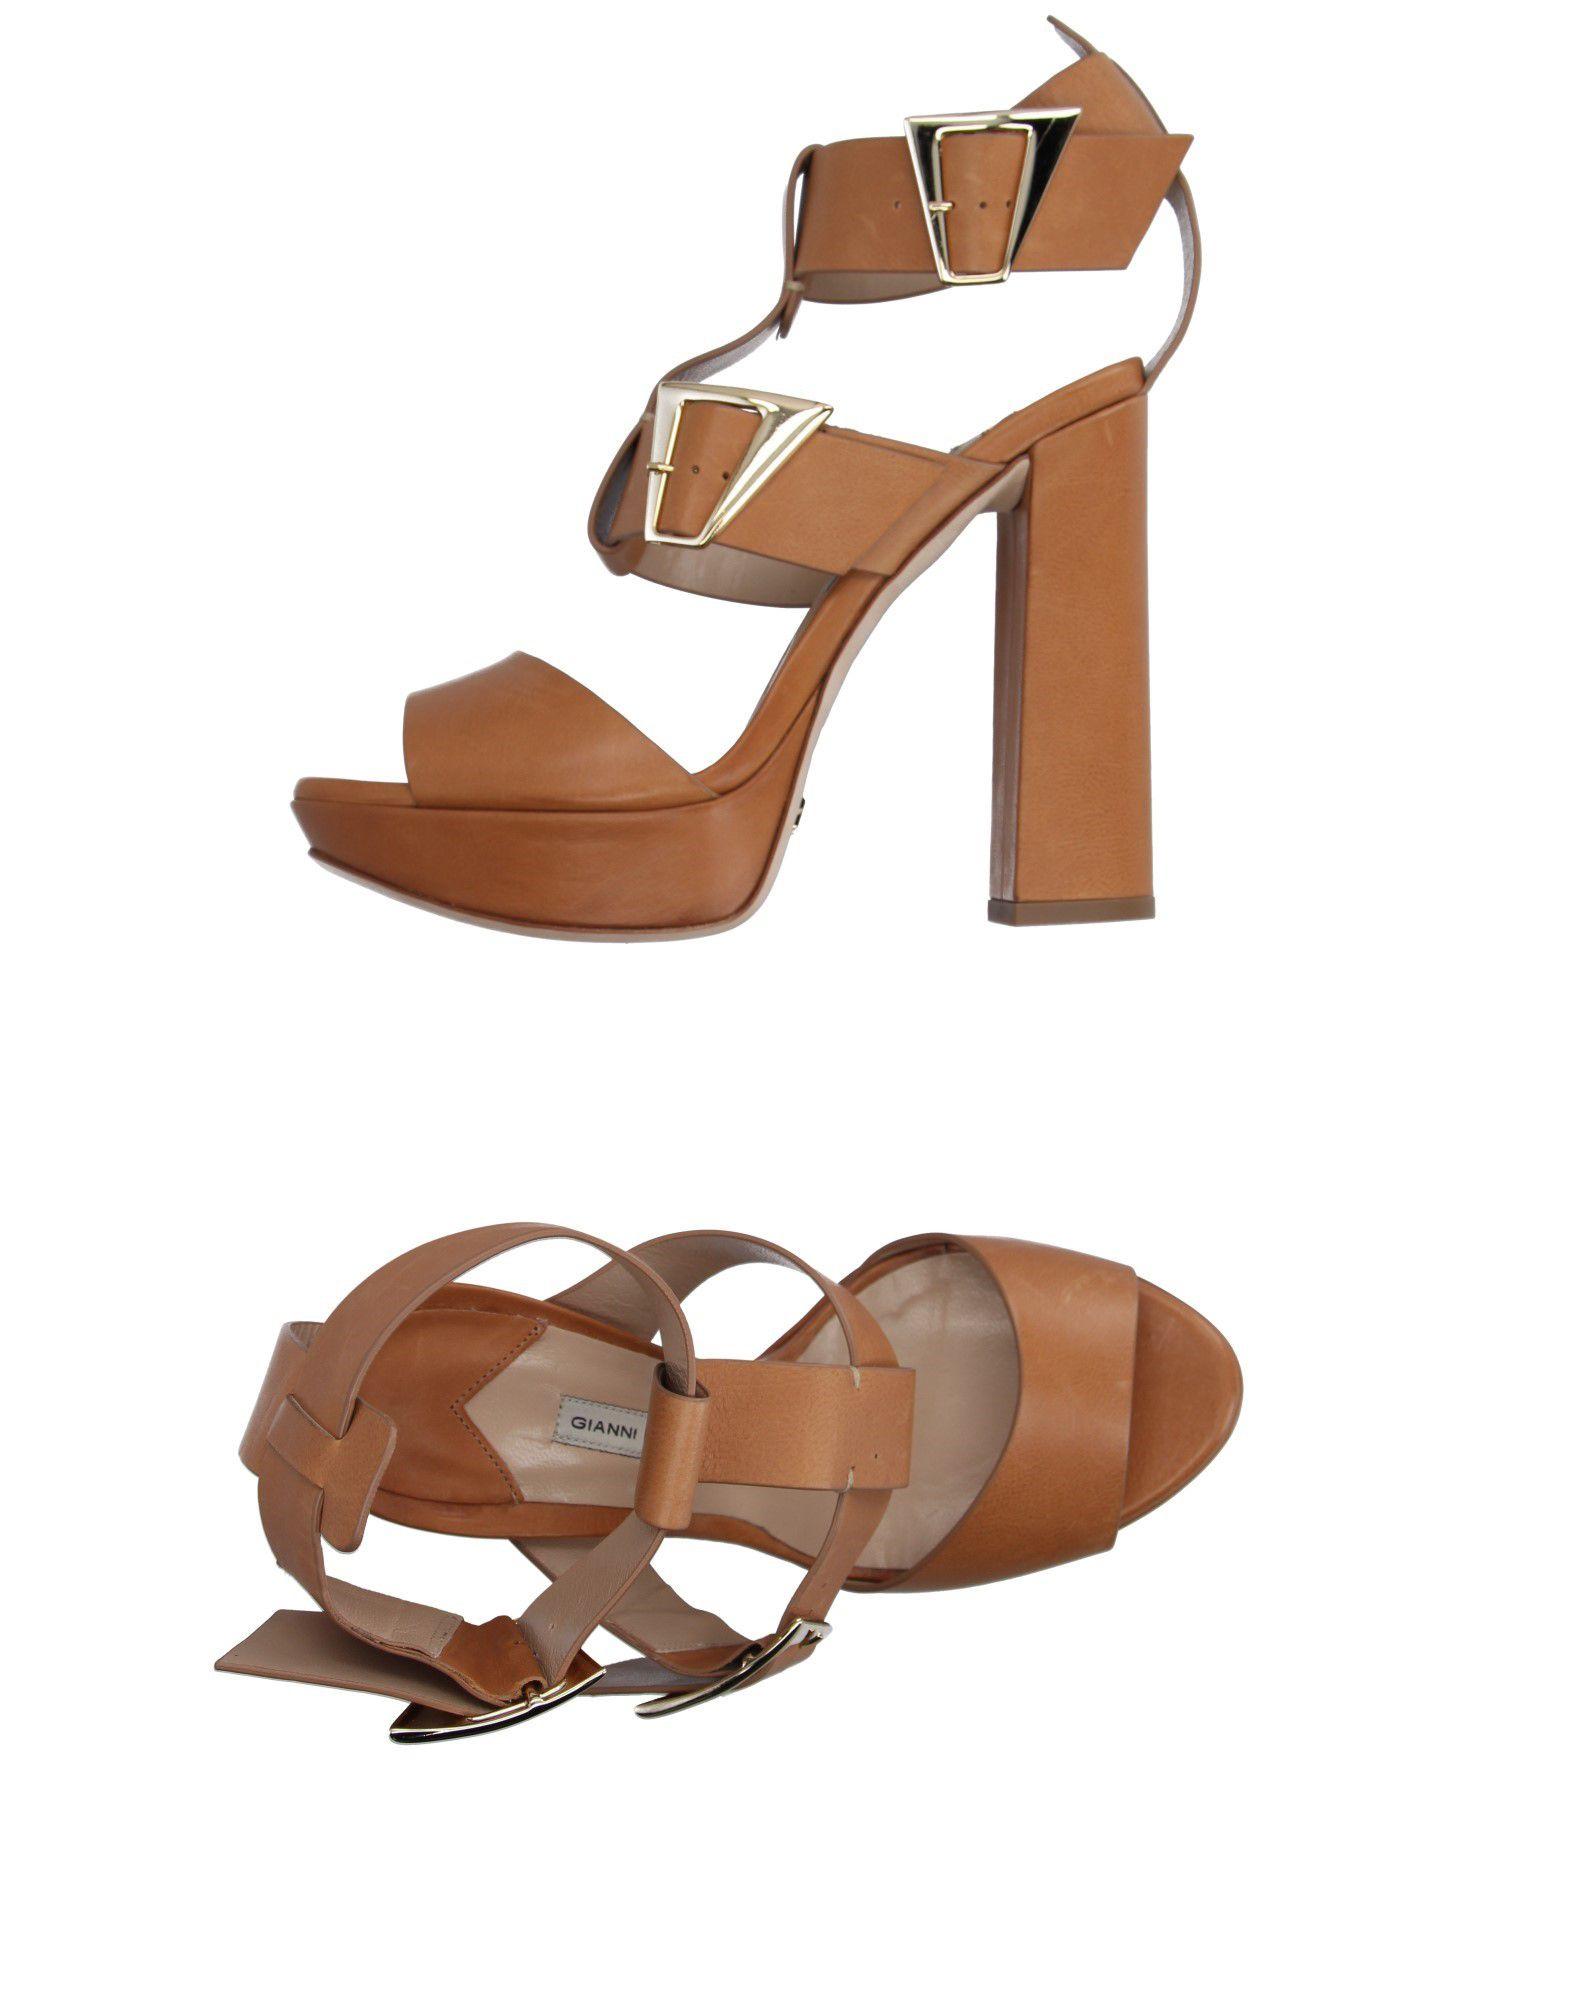 Gianni Marra Sandalen Damen  11142247OV Gute beliebte Qualität beliebte Gute Schuhe f7e949